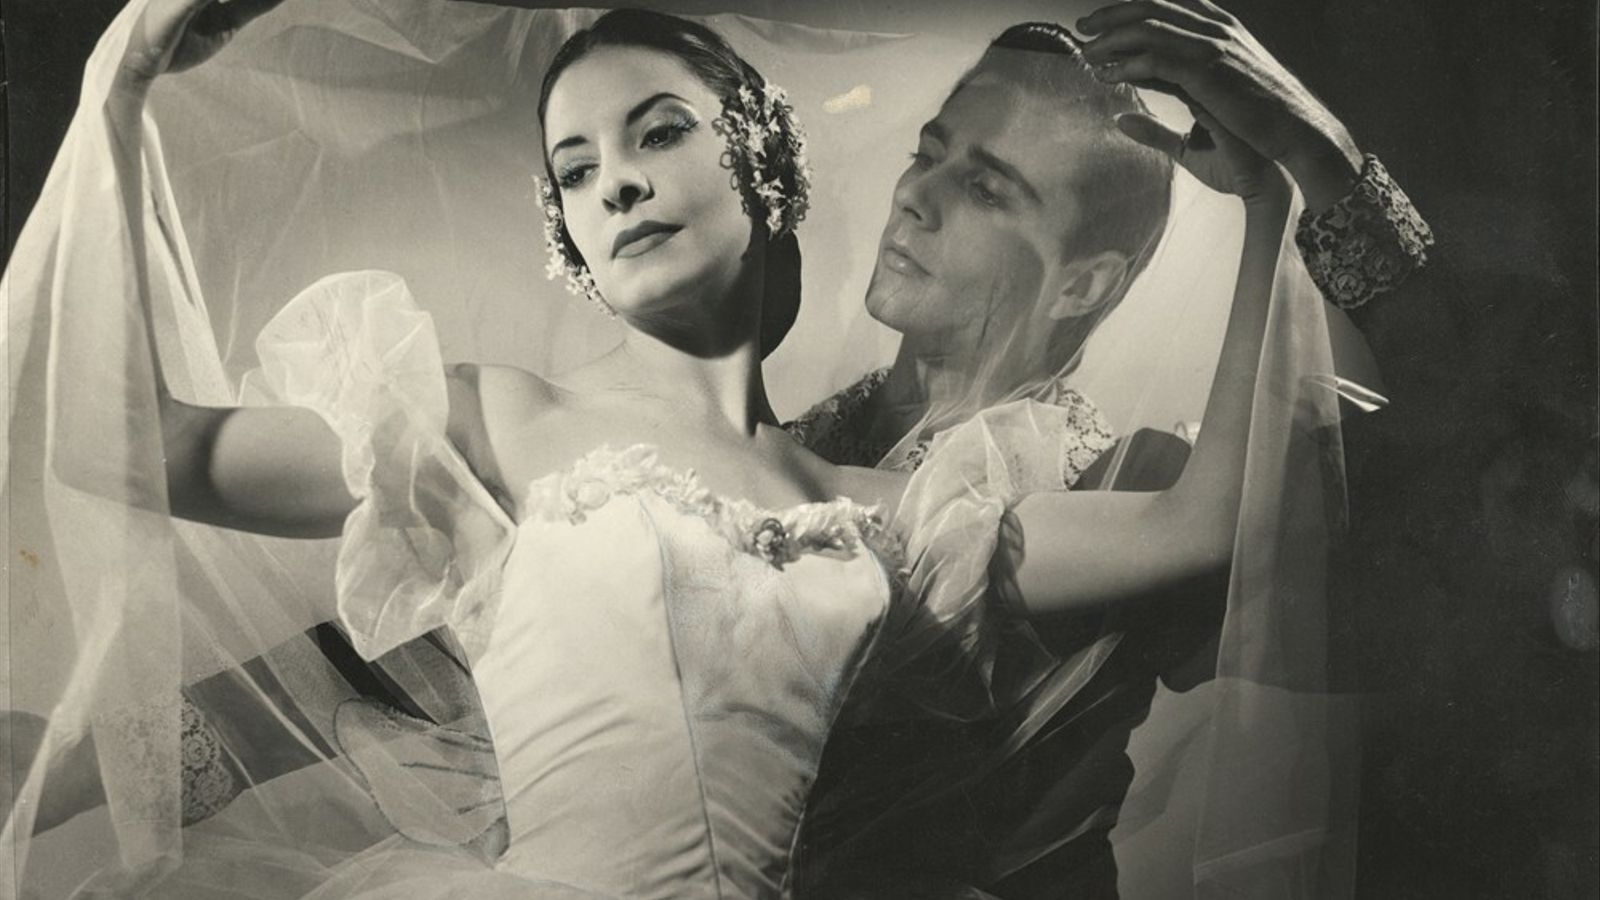 Mor Alícia Alonso, la darrera gran llegenda de la dansa clàssica del segle XX